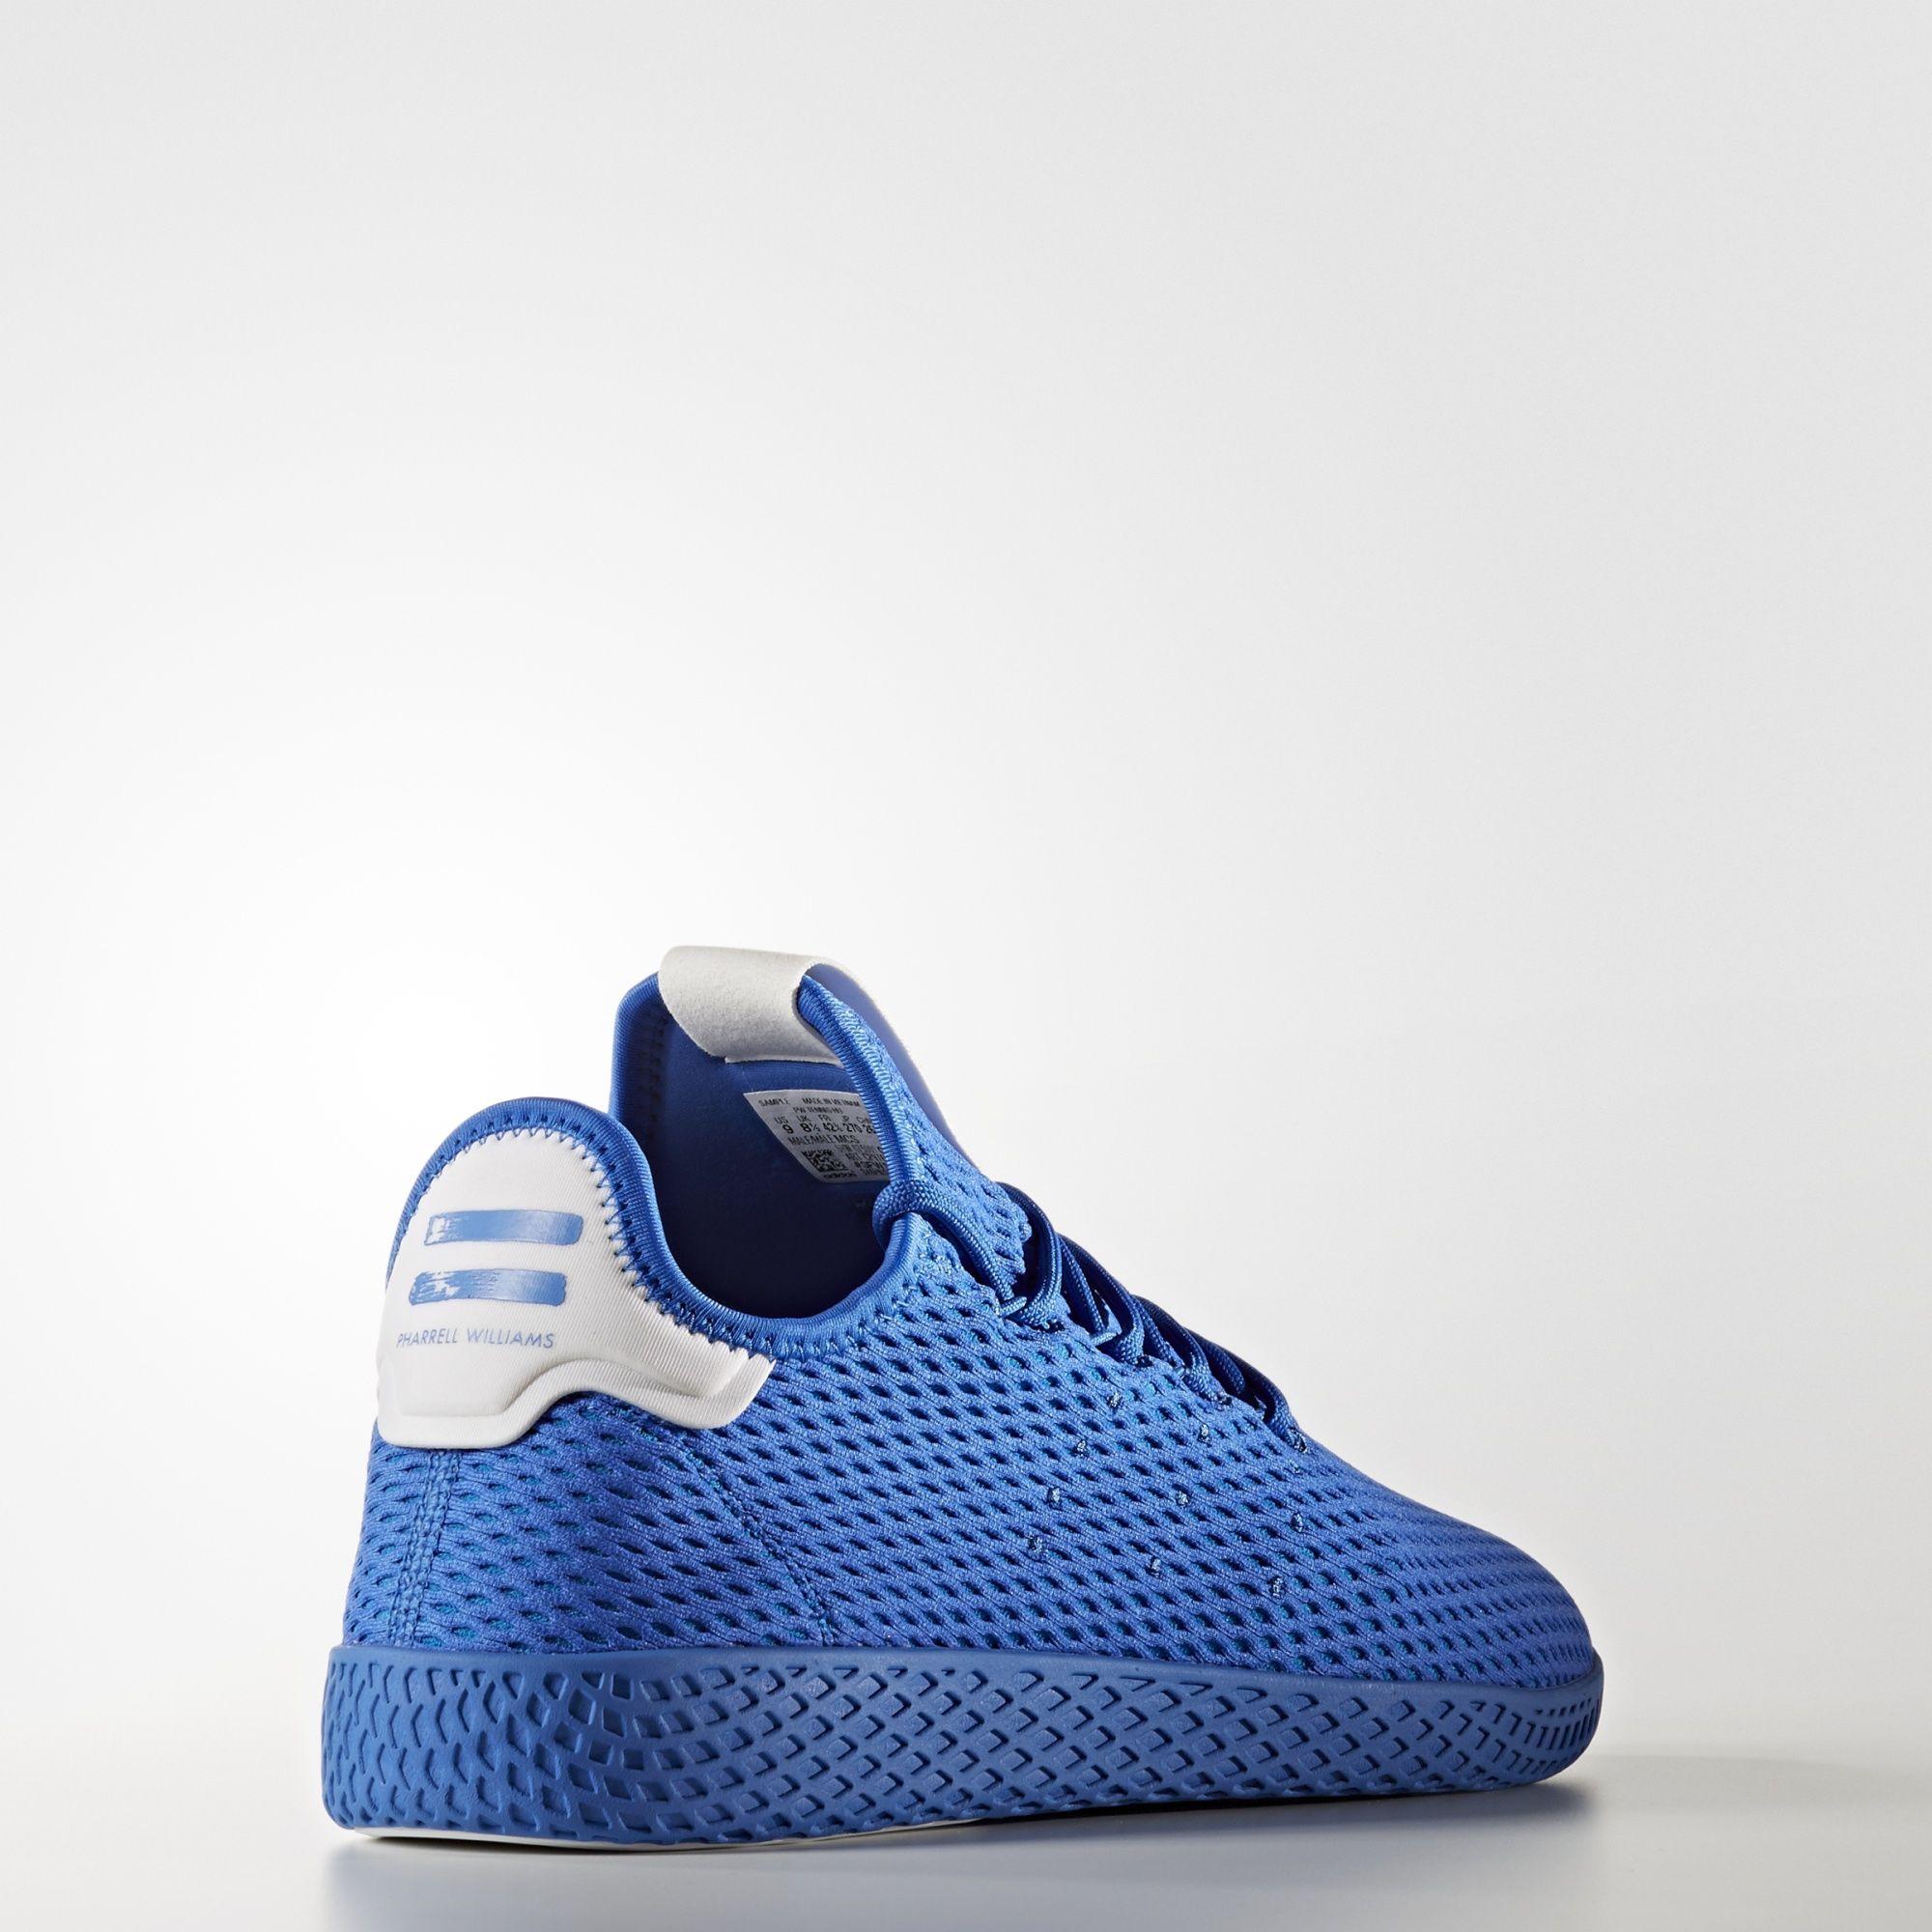 CP9766 Pharrell Williams x adidas Tennis HU Blue 3